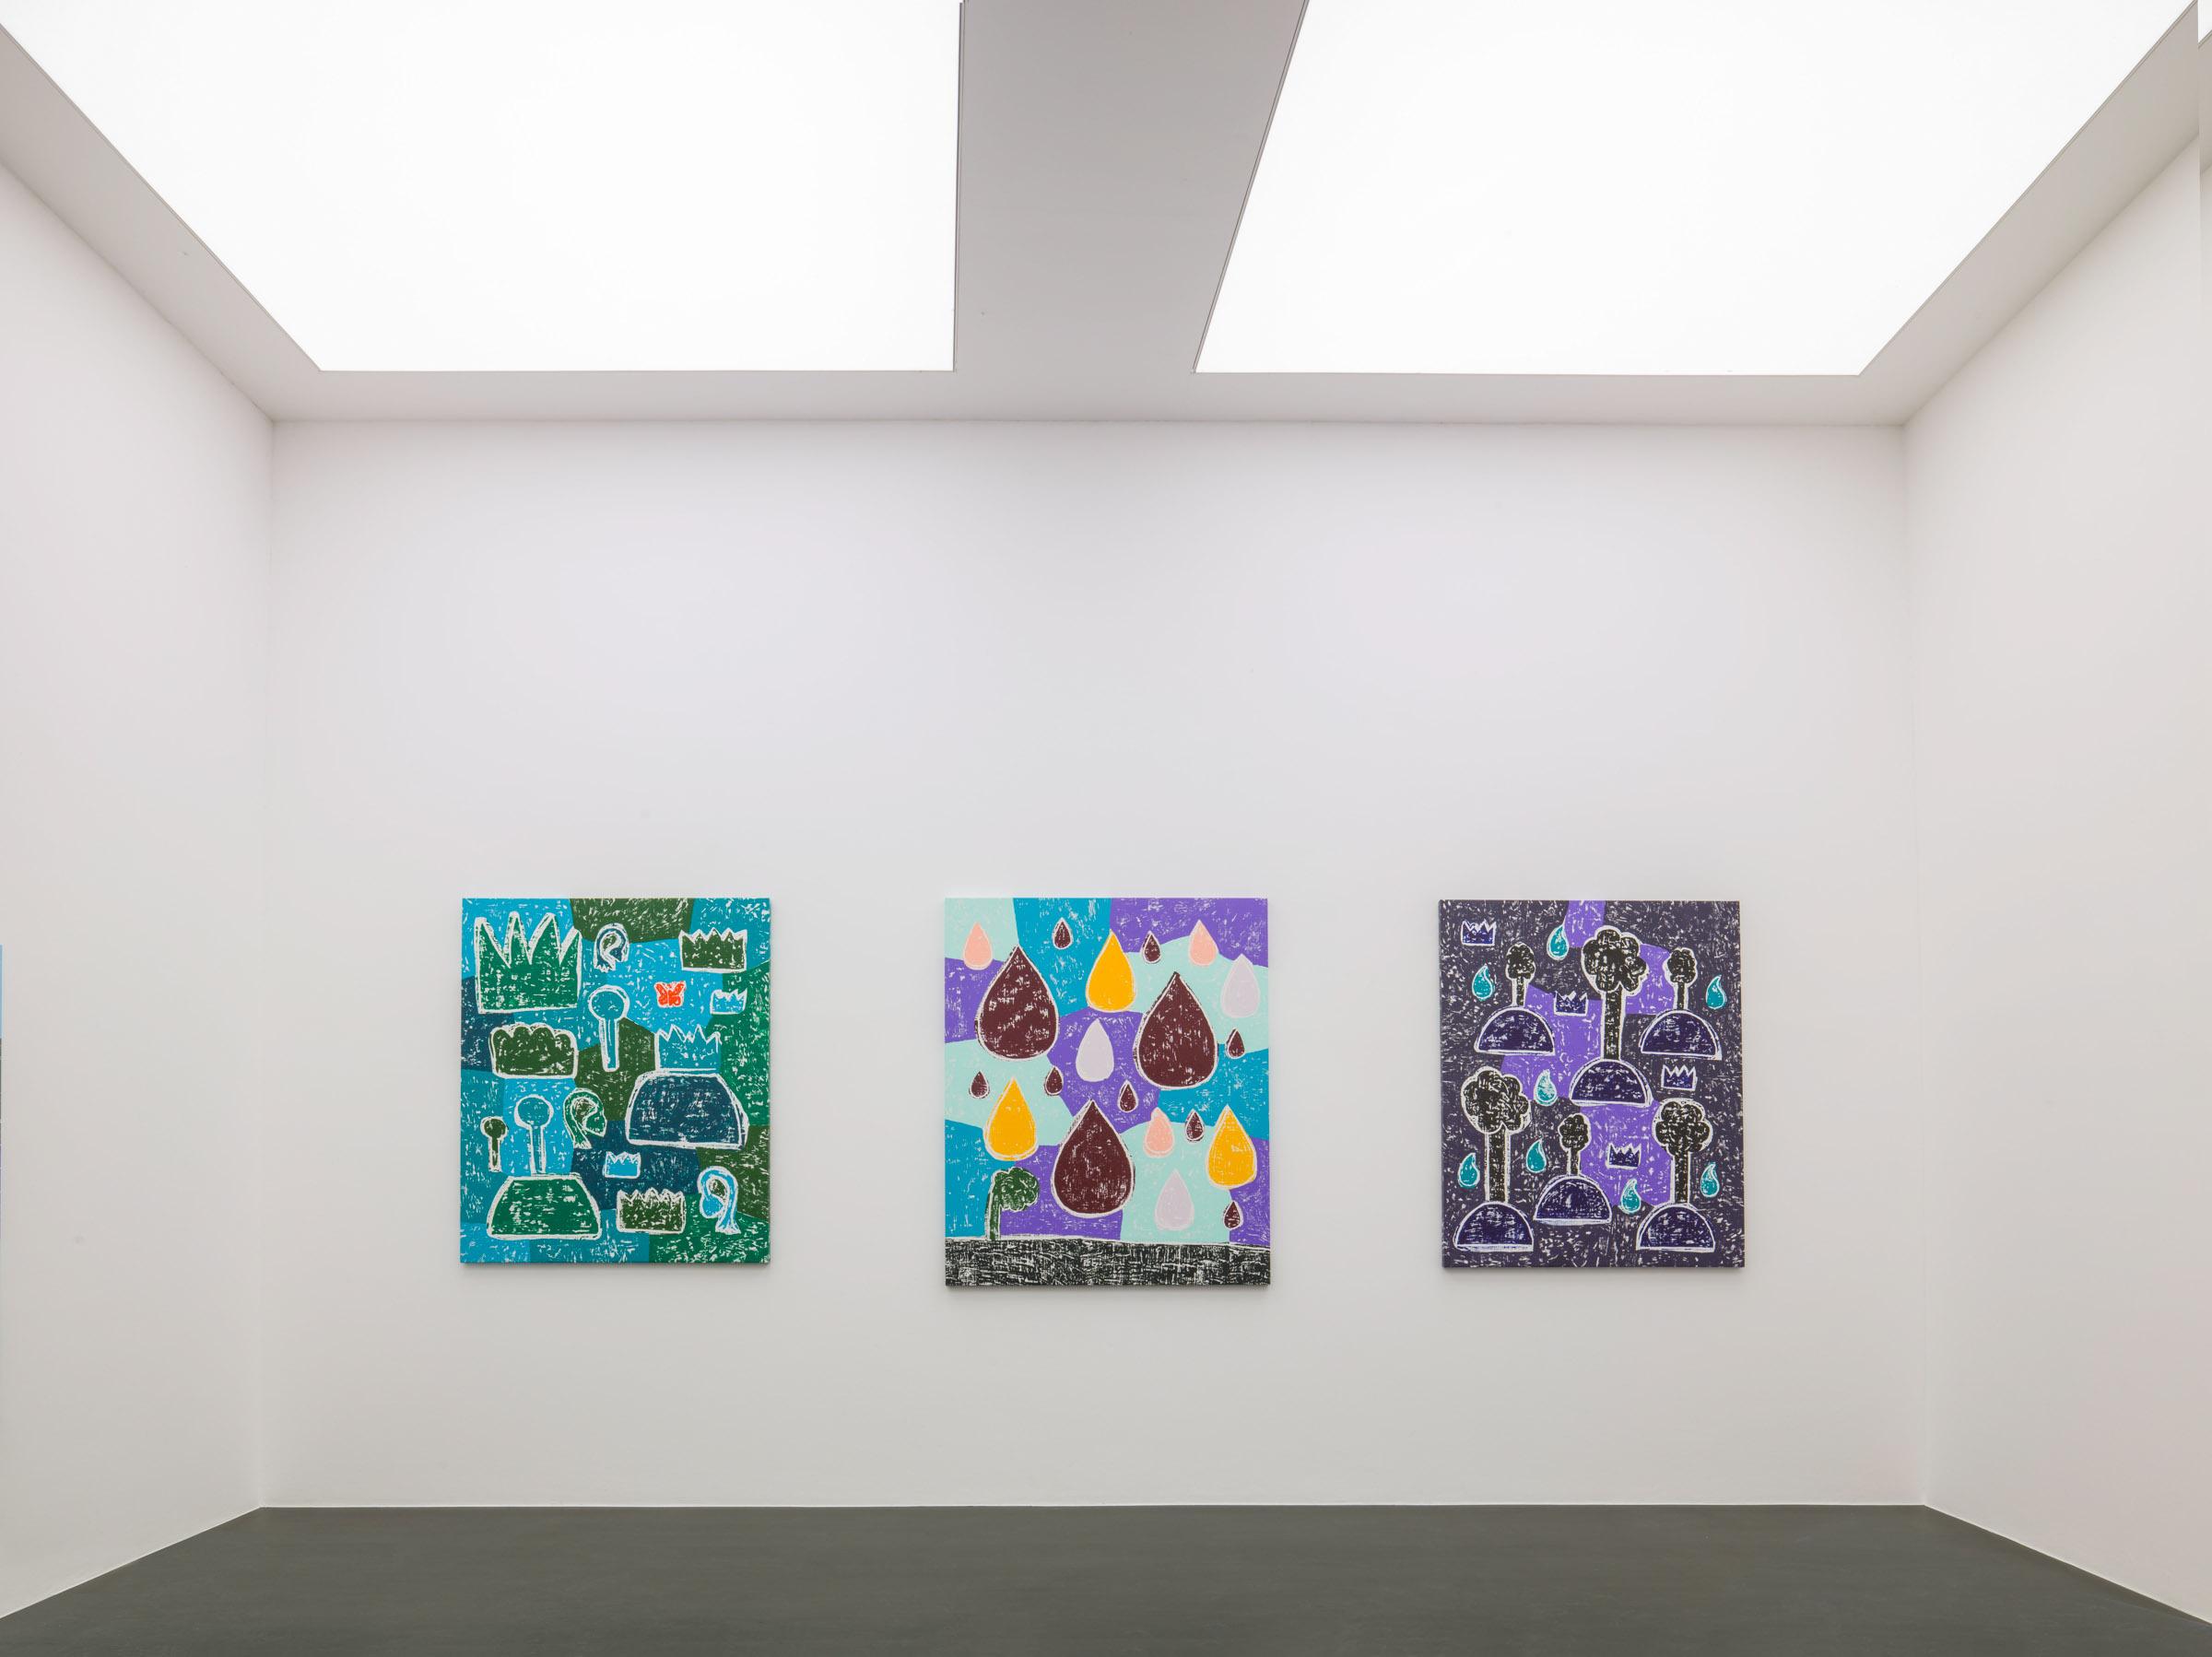 Exhibition: Olaf Breuning